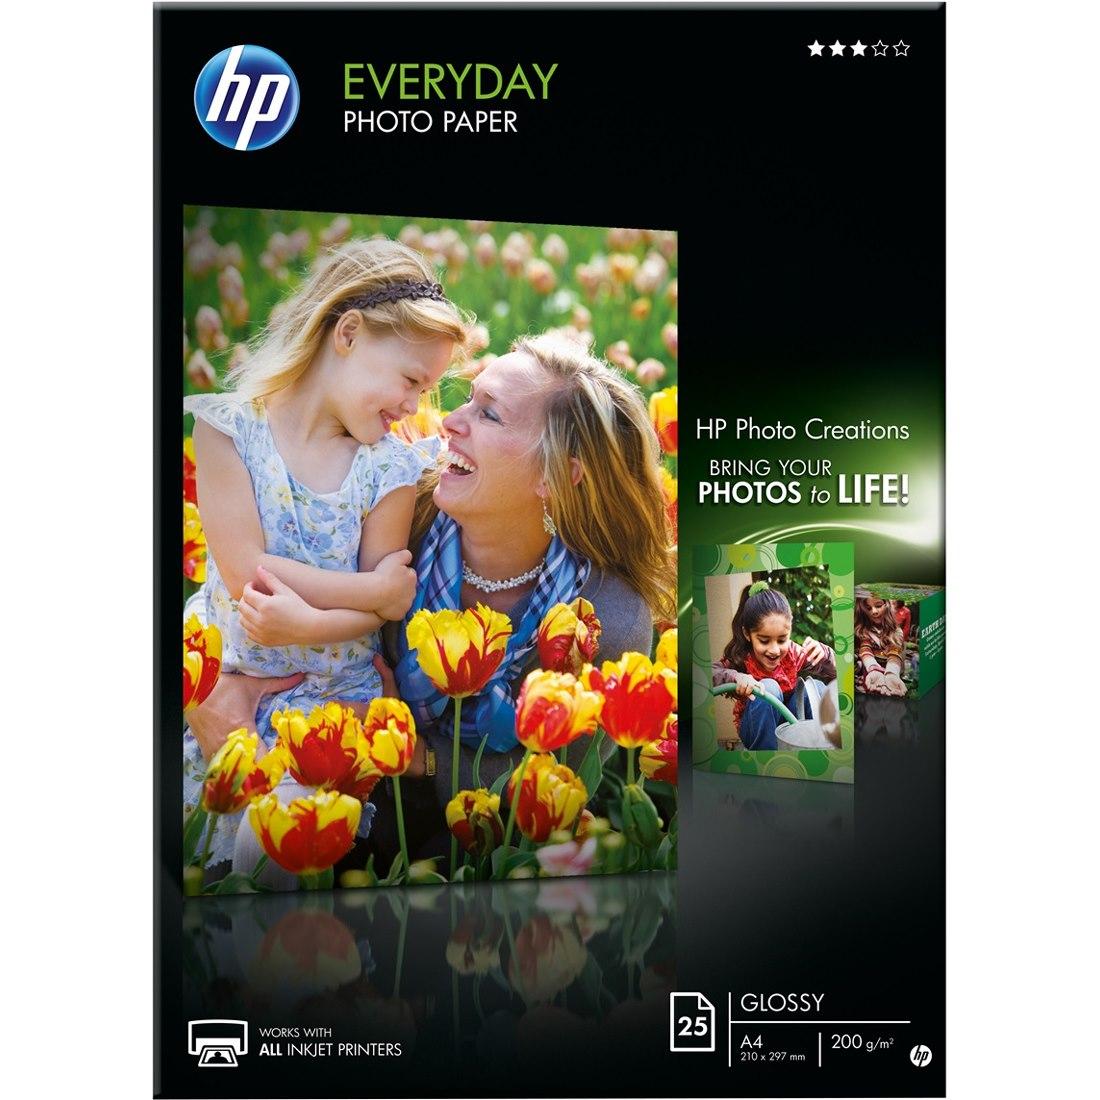 HP Everyday Inkjet Print Photo Paper